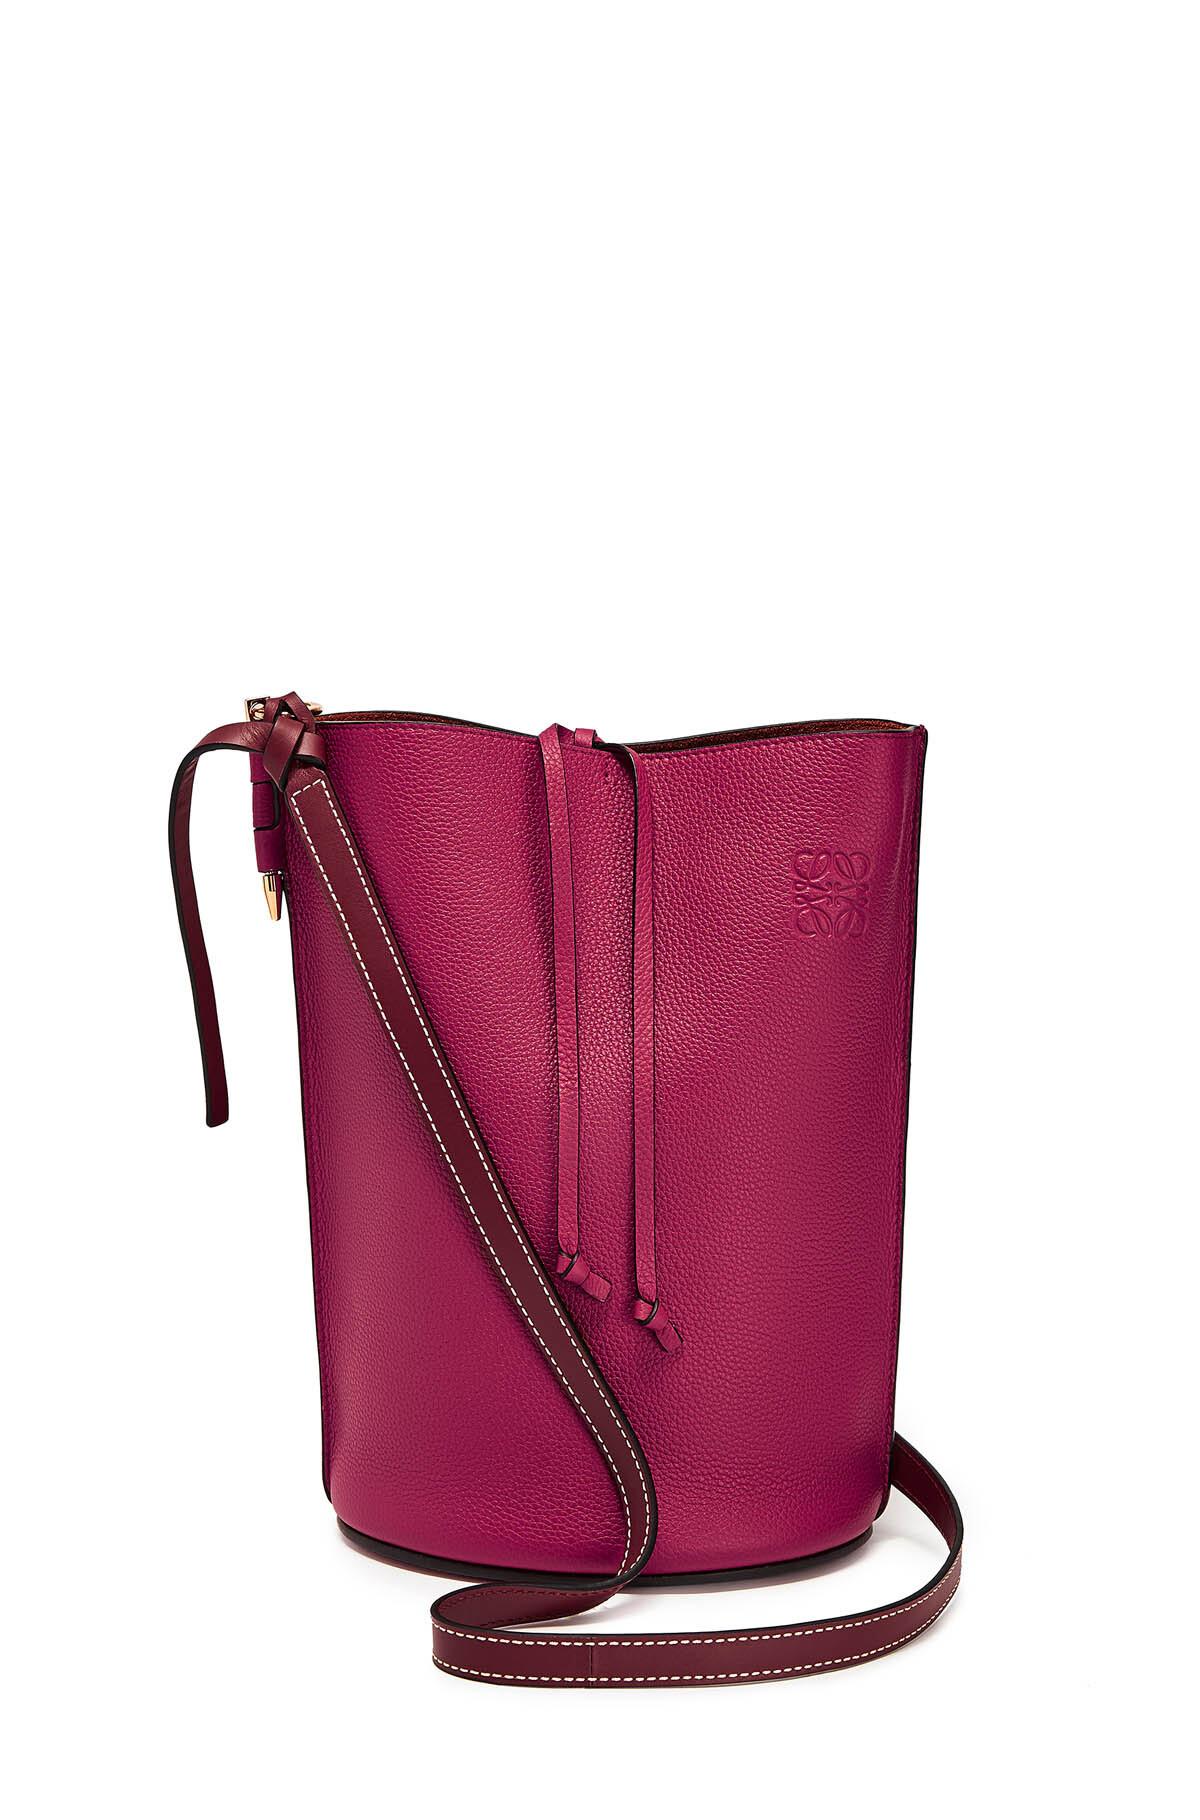 LOEWE Gate Bucket Bag Raspberry/Wine front